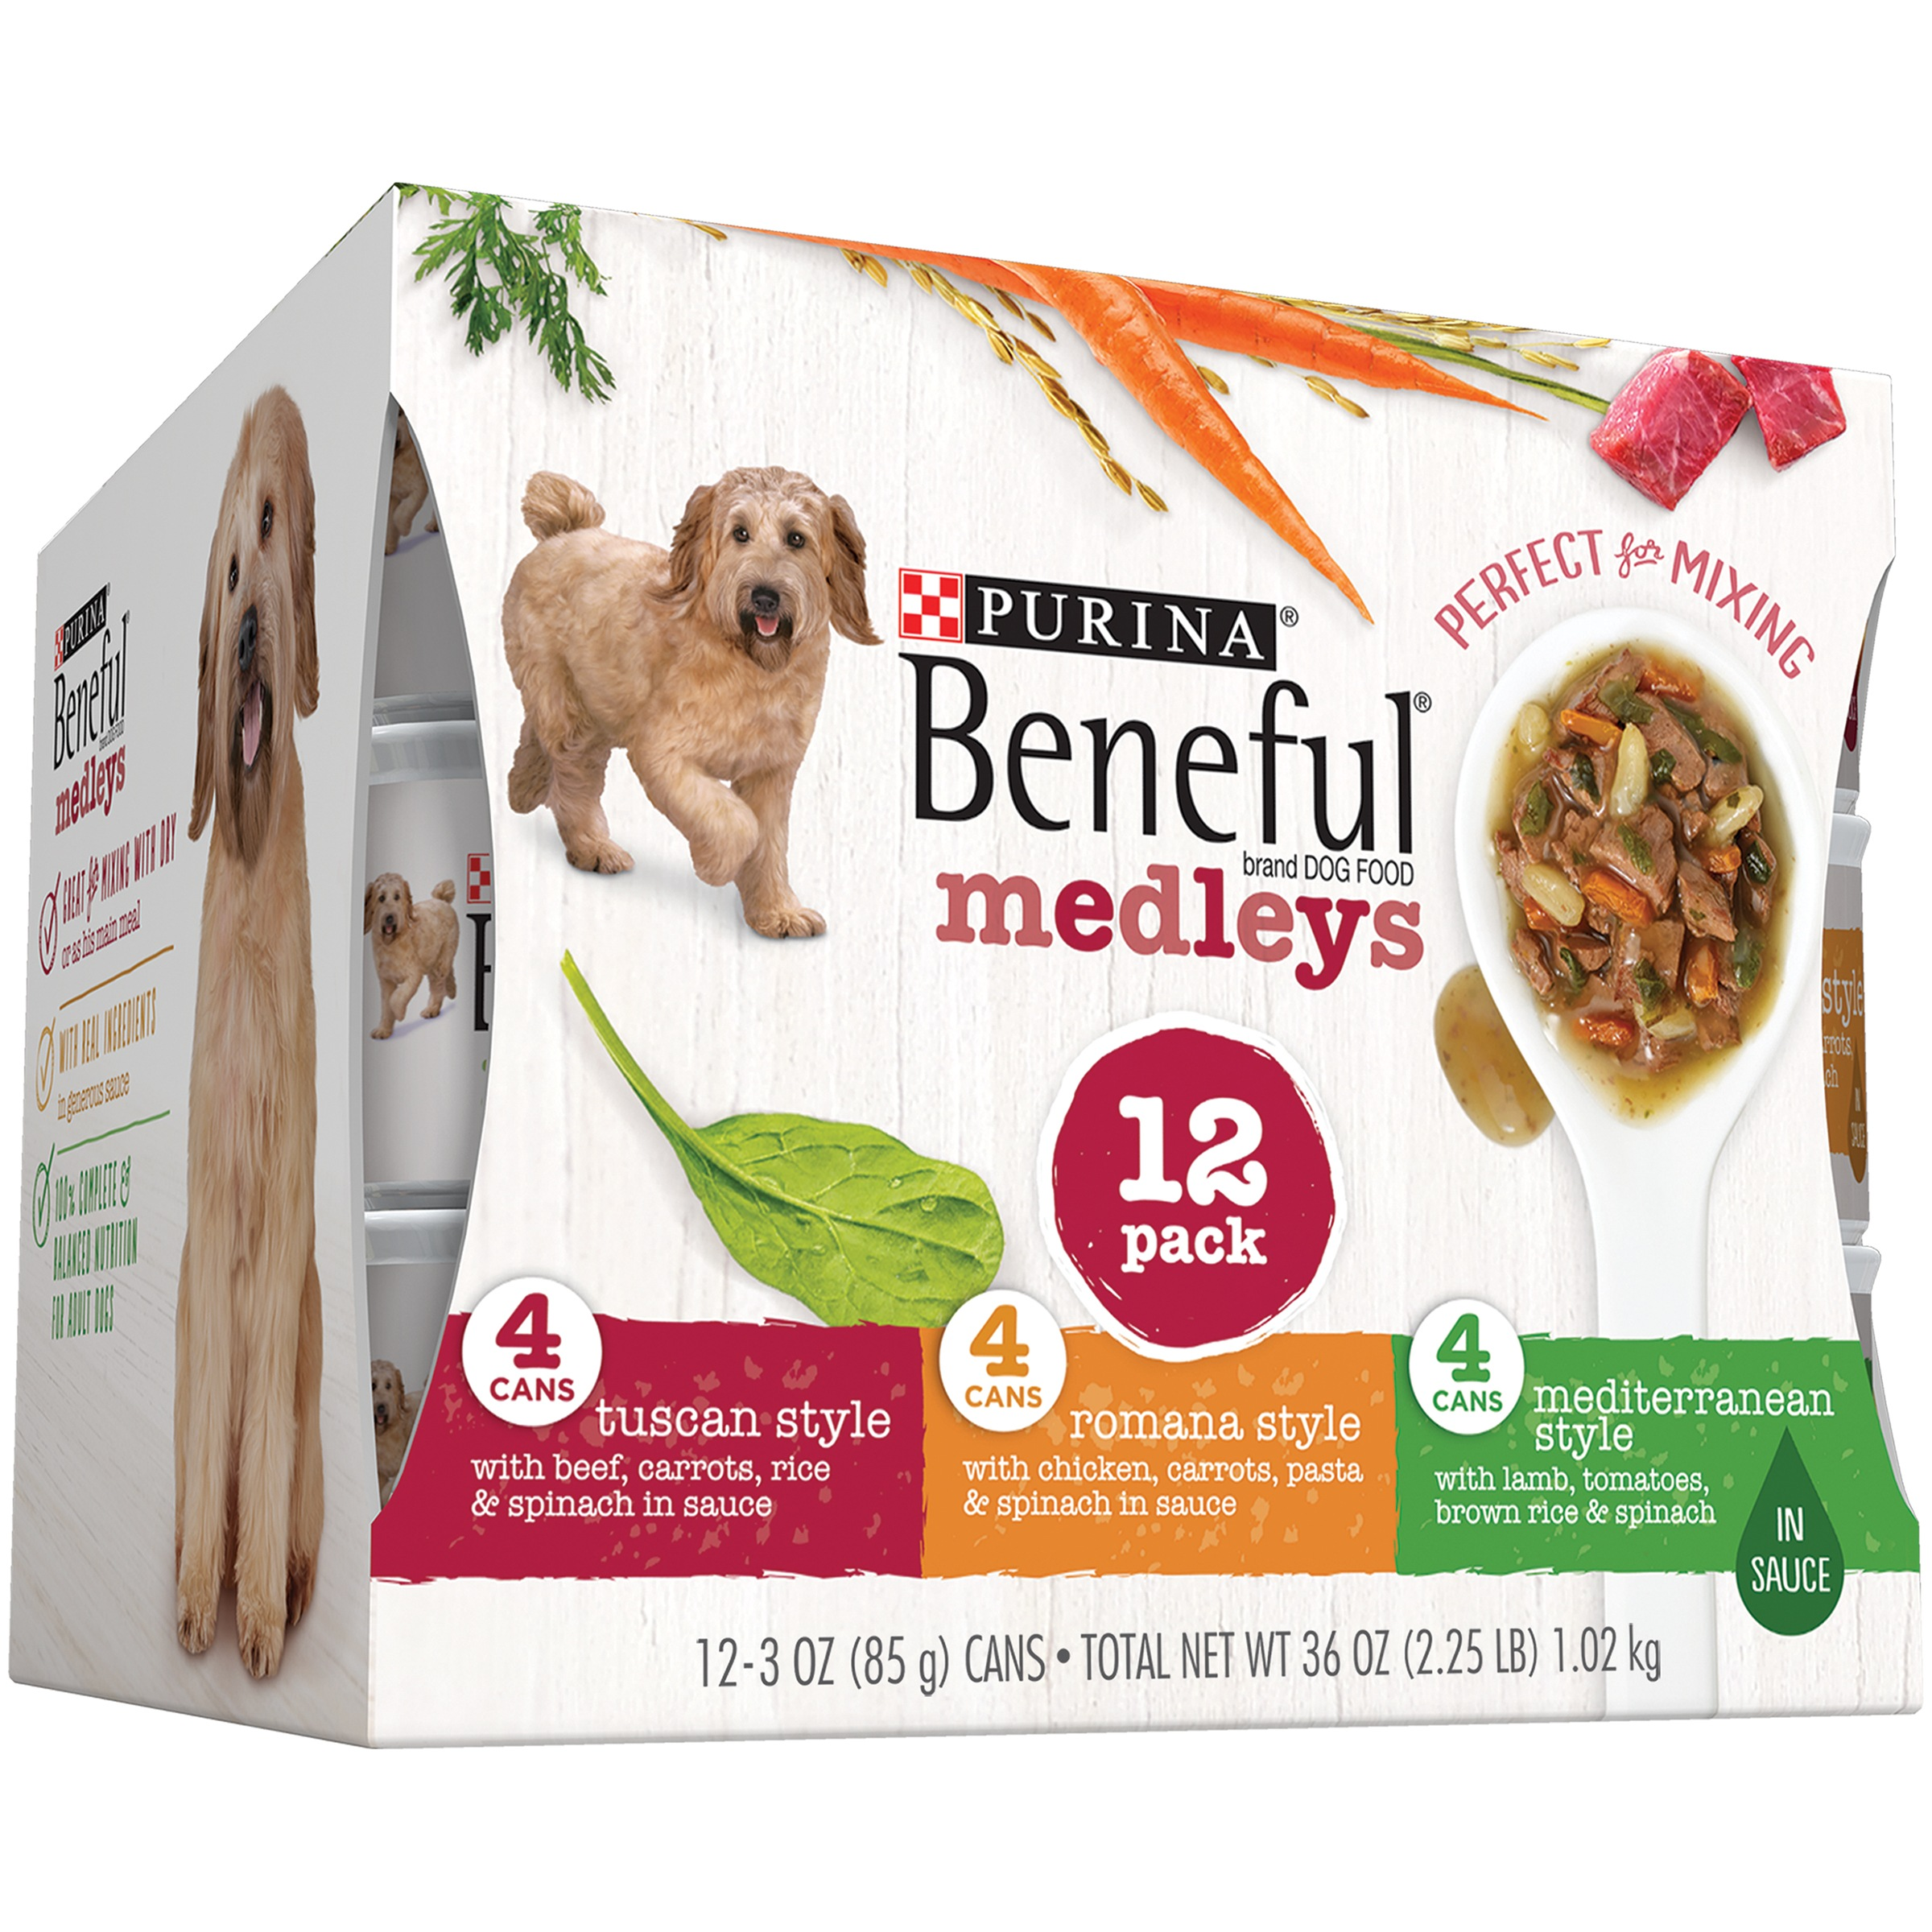 Purina Beneful Medleys Tuscan, Romana & Mediterranean Style Variety Pack Wet Dog Food, 3 Oz, Case of 12